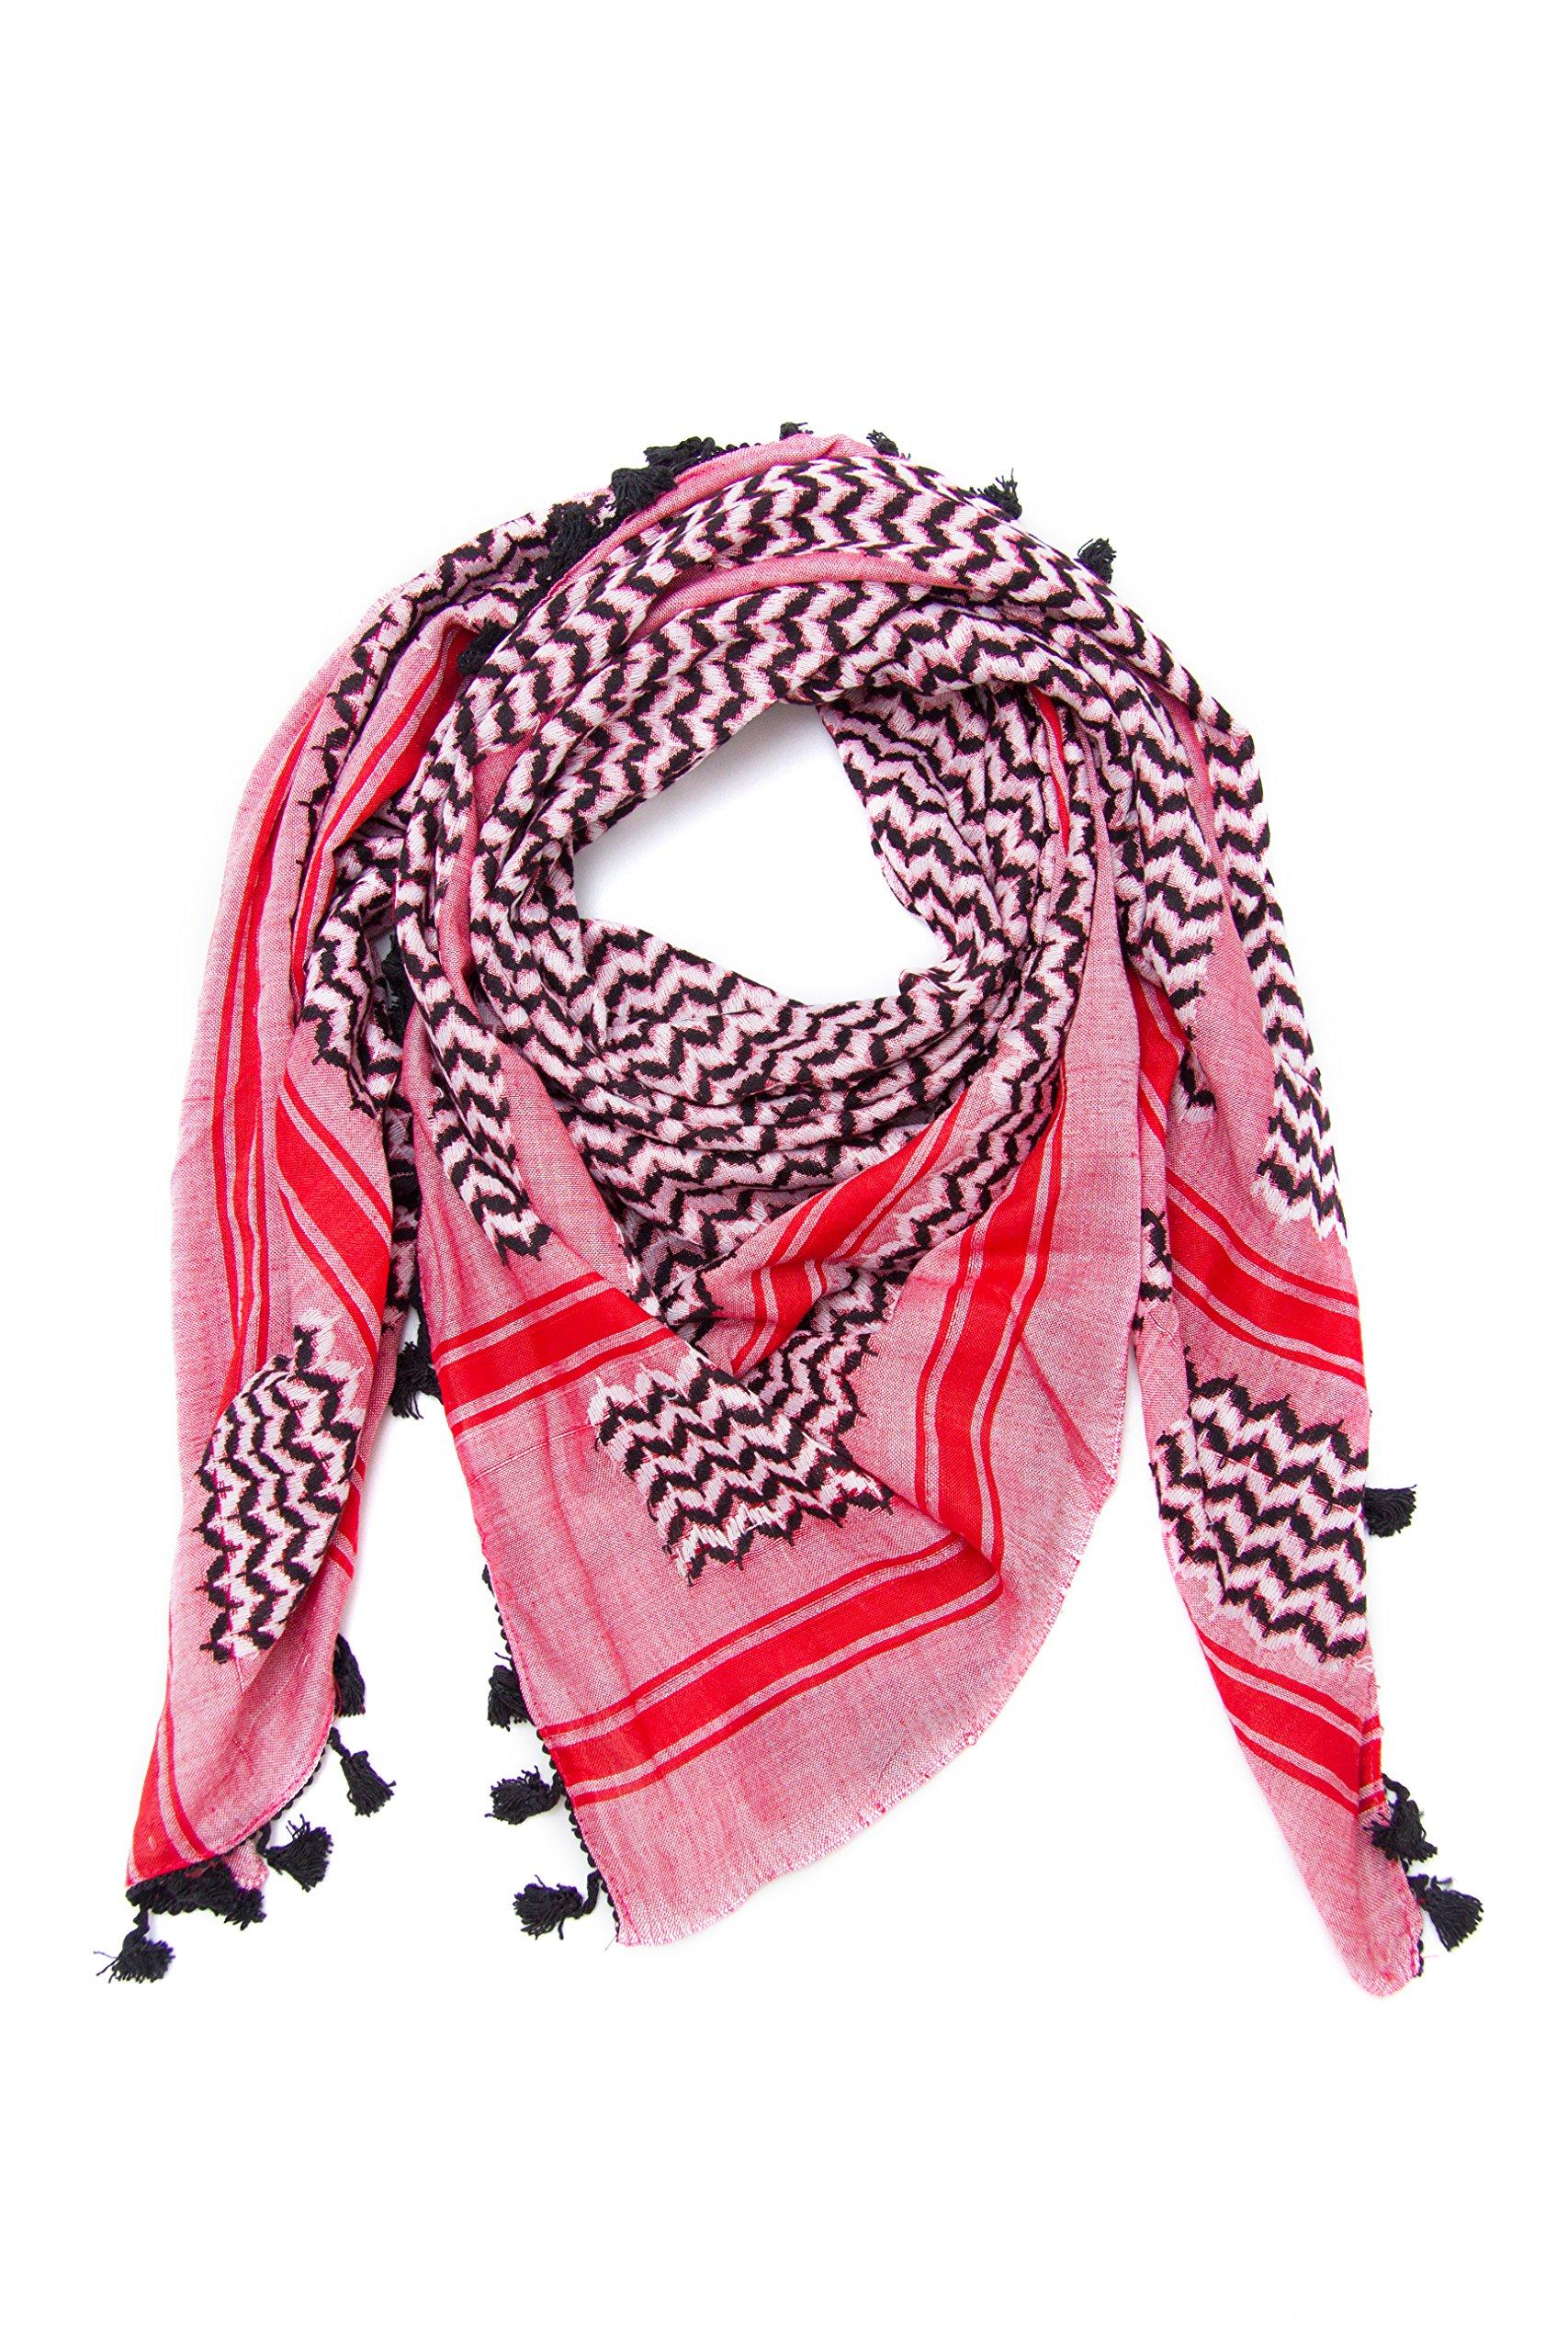 Hirbawi Premium Arabic Scarf 100% Cotton Shemagh Keffiyeh 47''x47'' Arab Scarf (Pink Zahra) Made in Palestine by Hirbawi (Image #1)